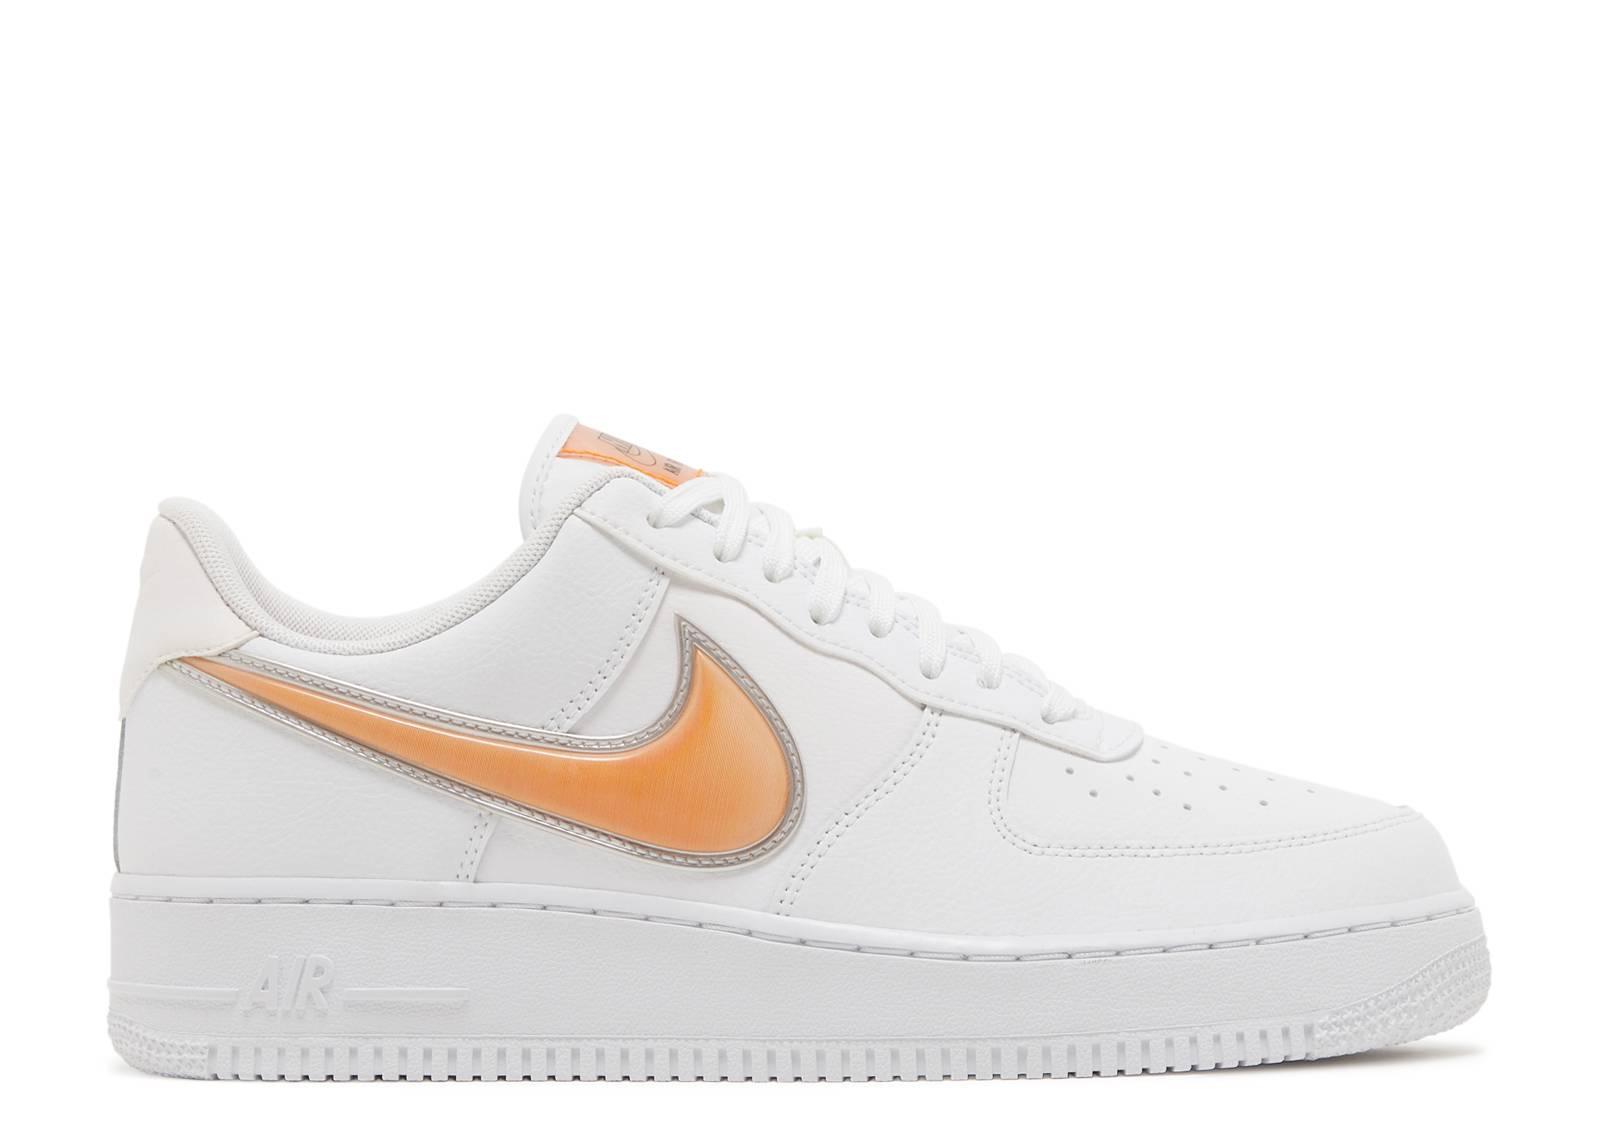 Nike Air Force 1 Low BlancheOrange | AO2441 102